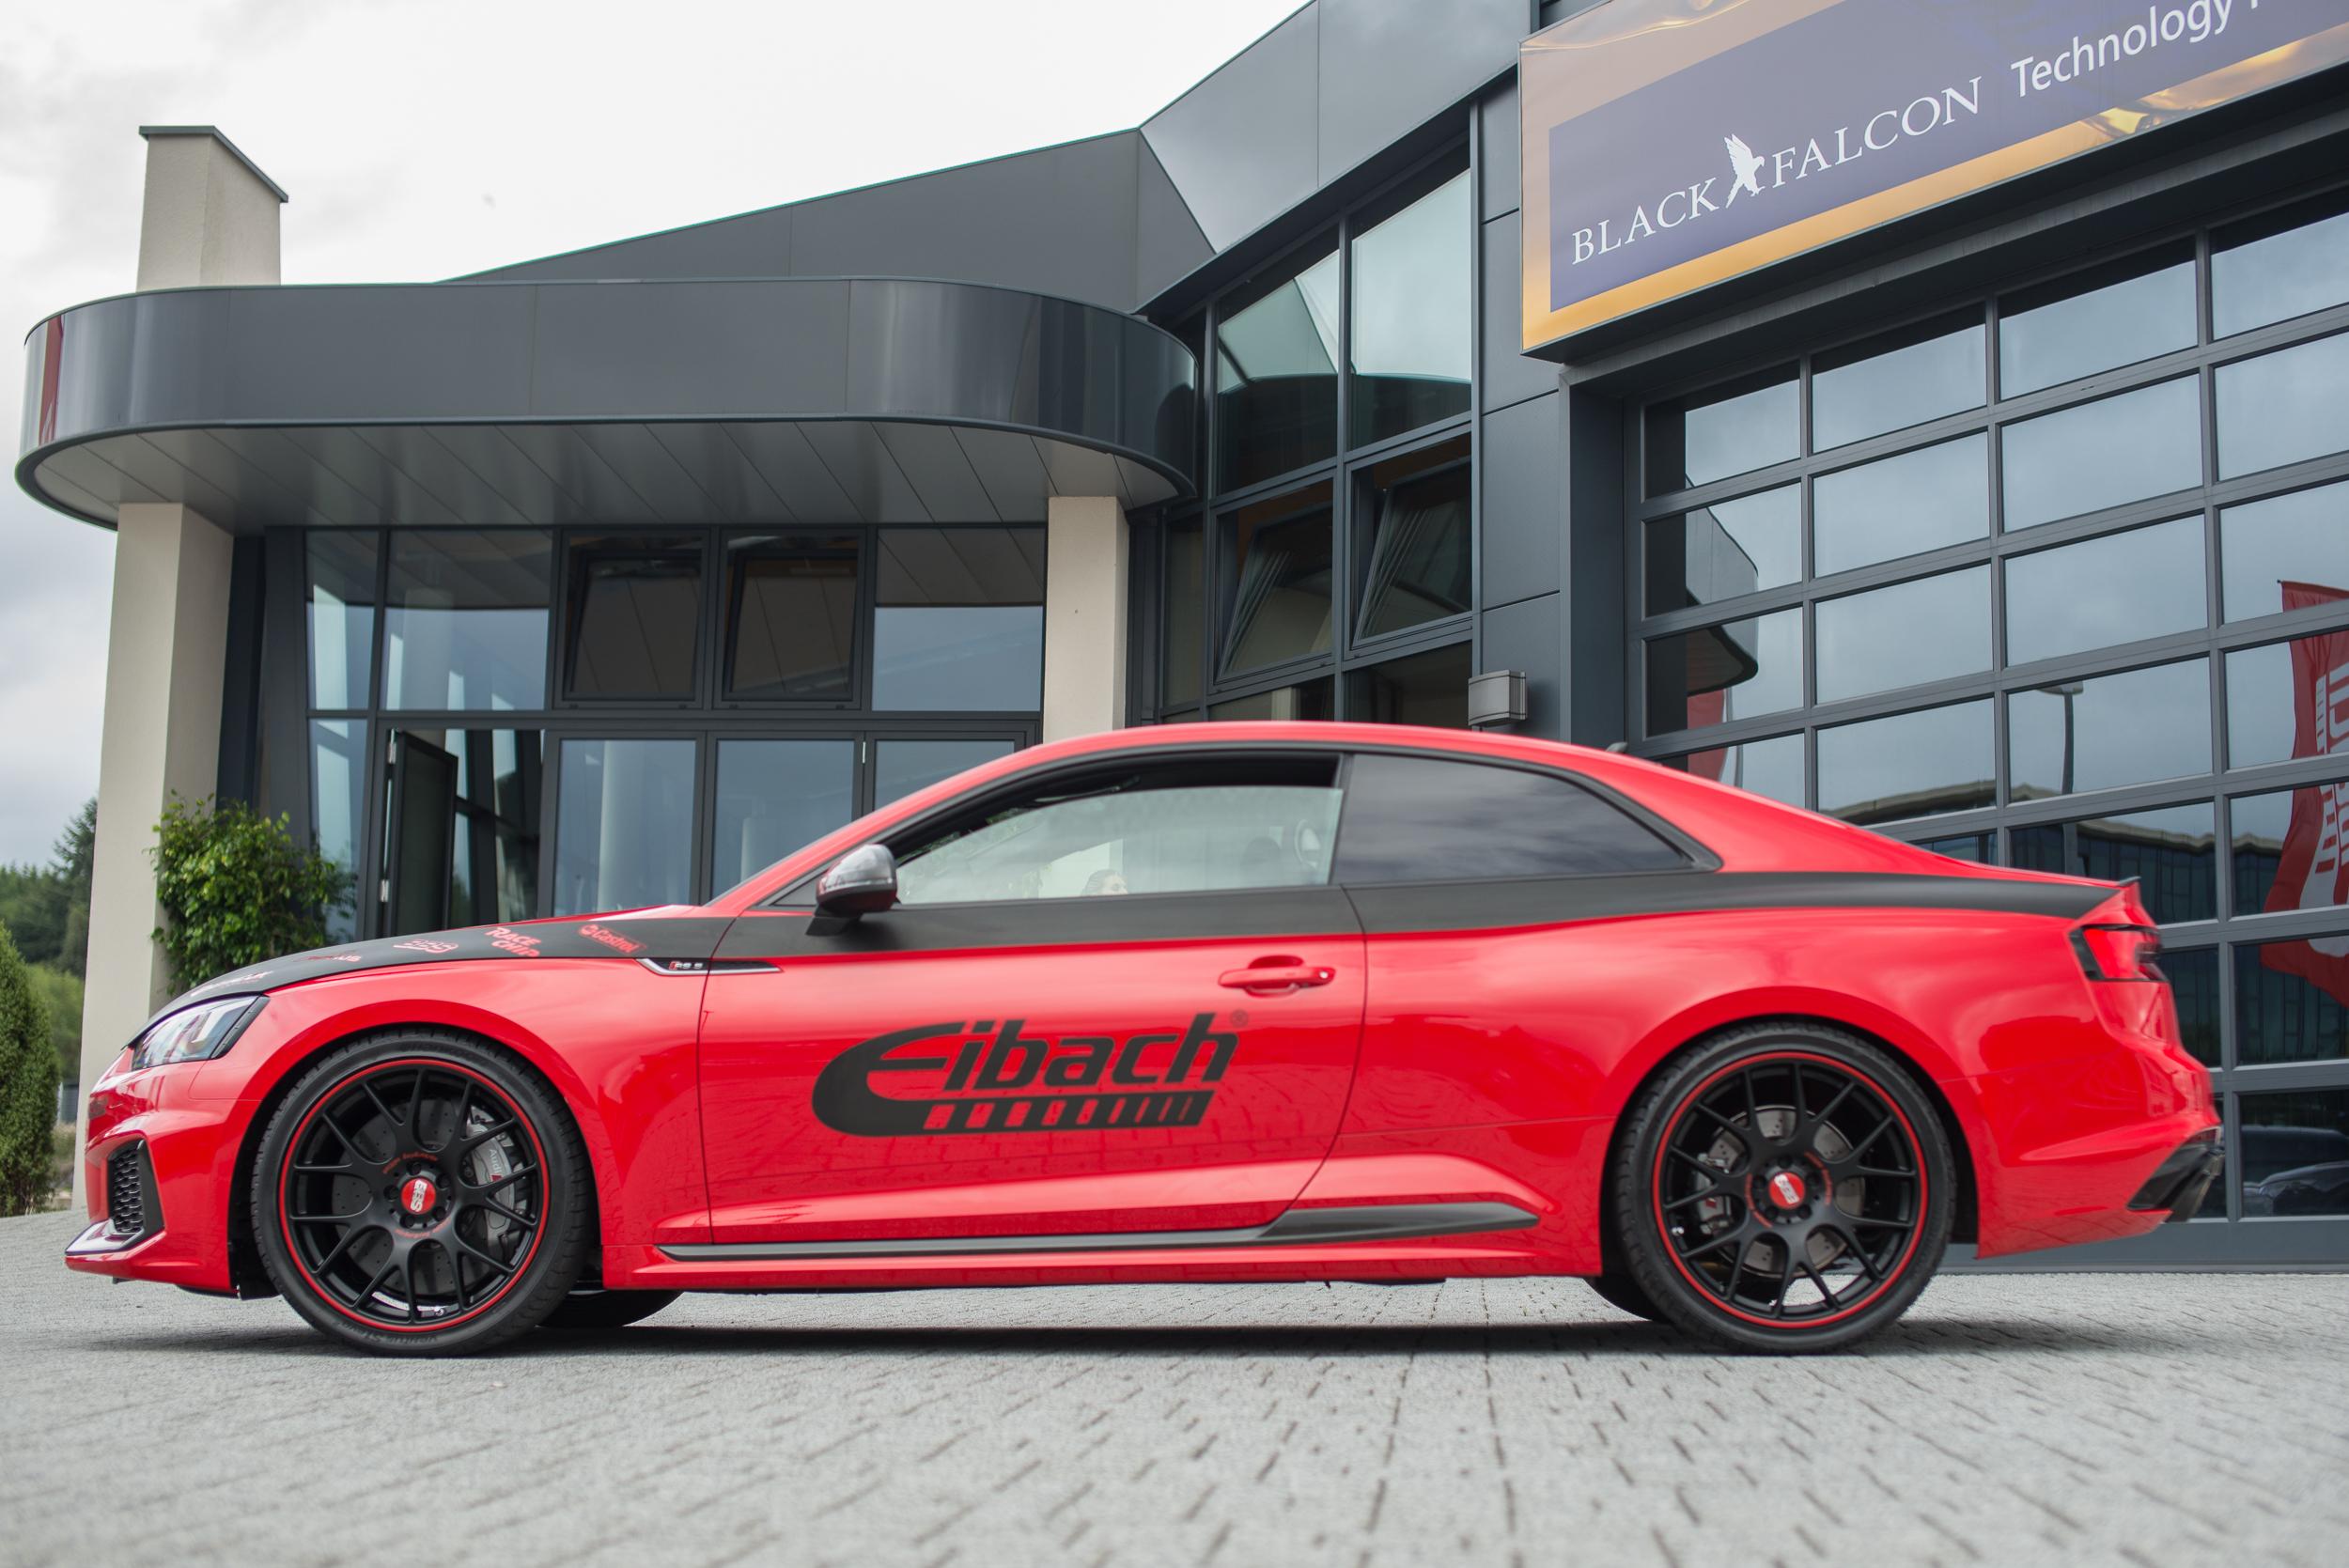 Audi RS5 Coupé 2017 Felgen & Mehr: Tuning á la Eibach ...